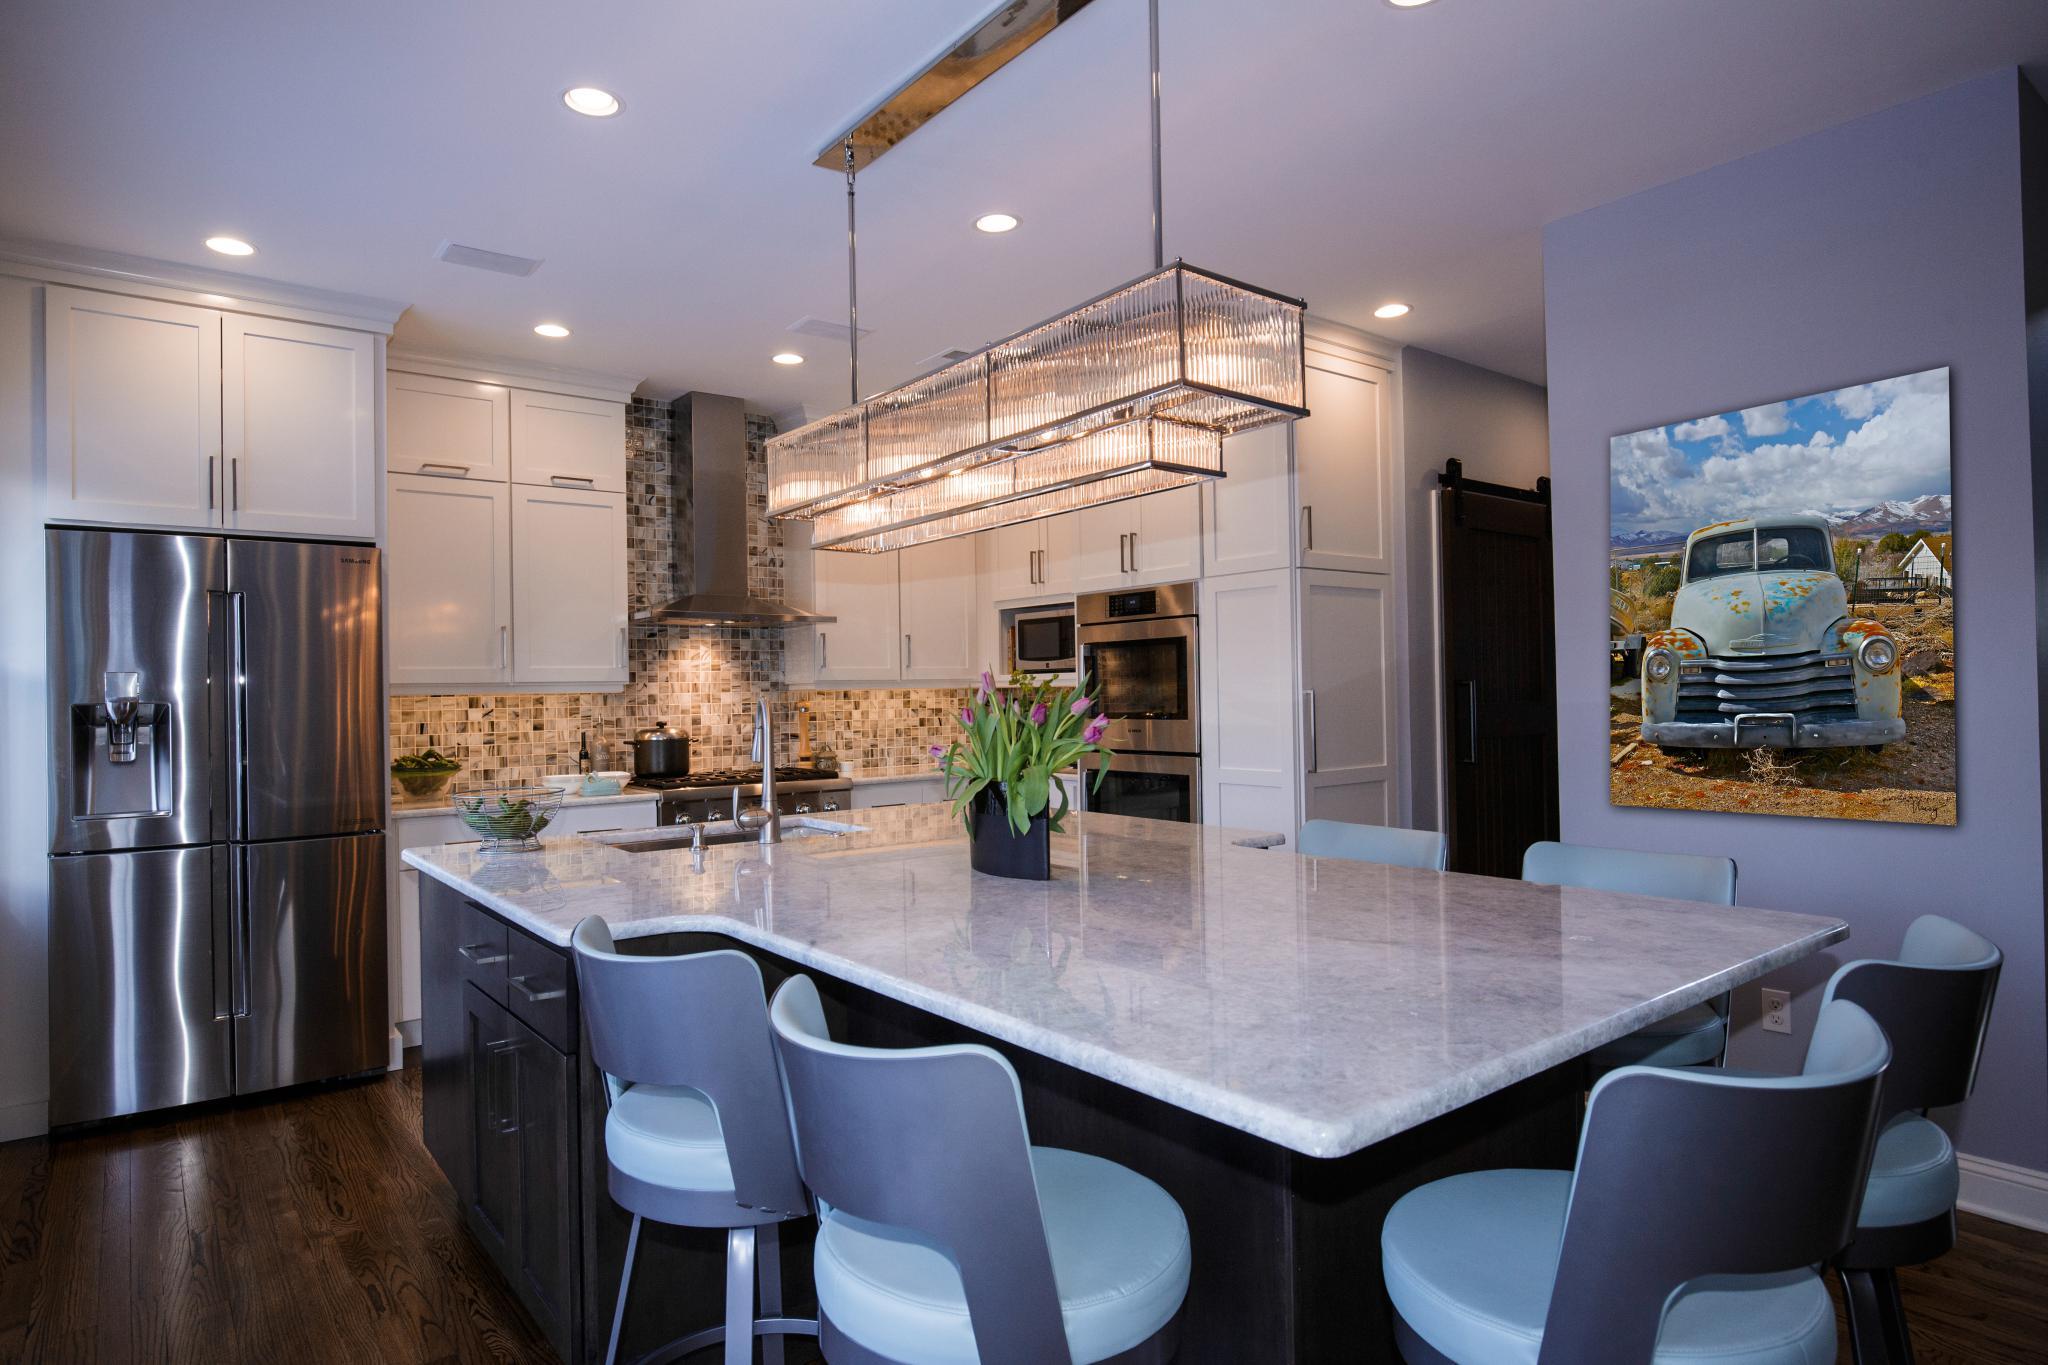 Kitchen Design Gallery Custom Kitchens Performance Kitchens Home